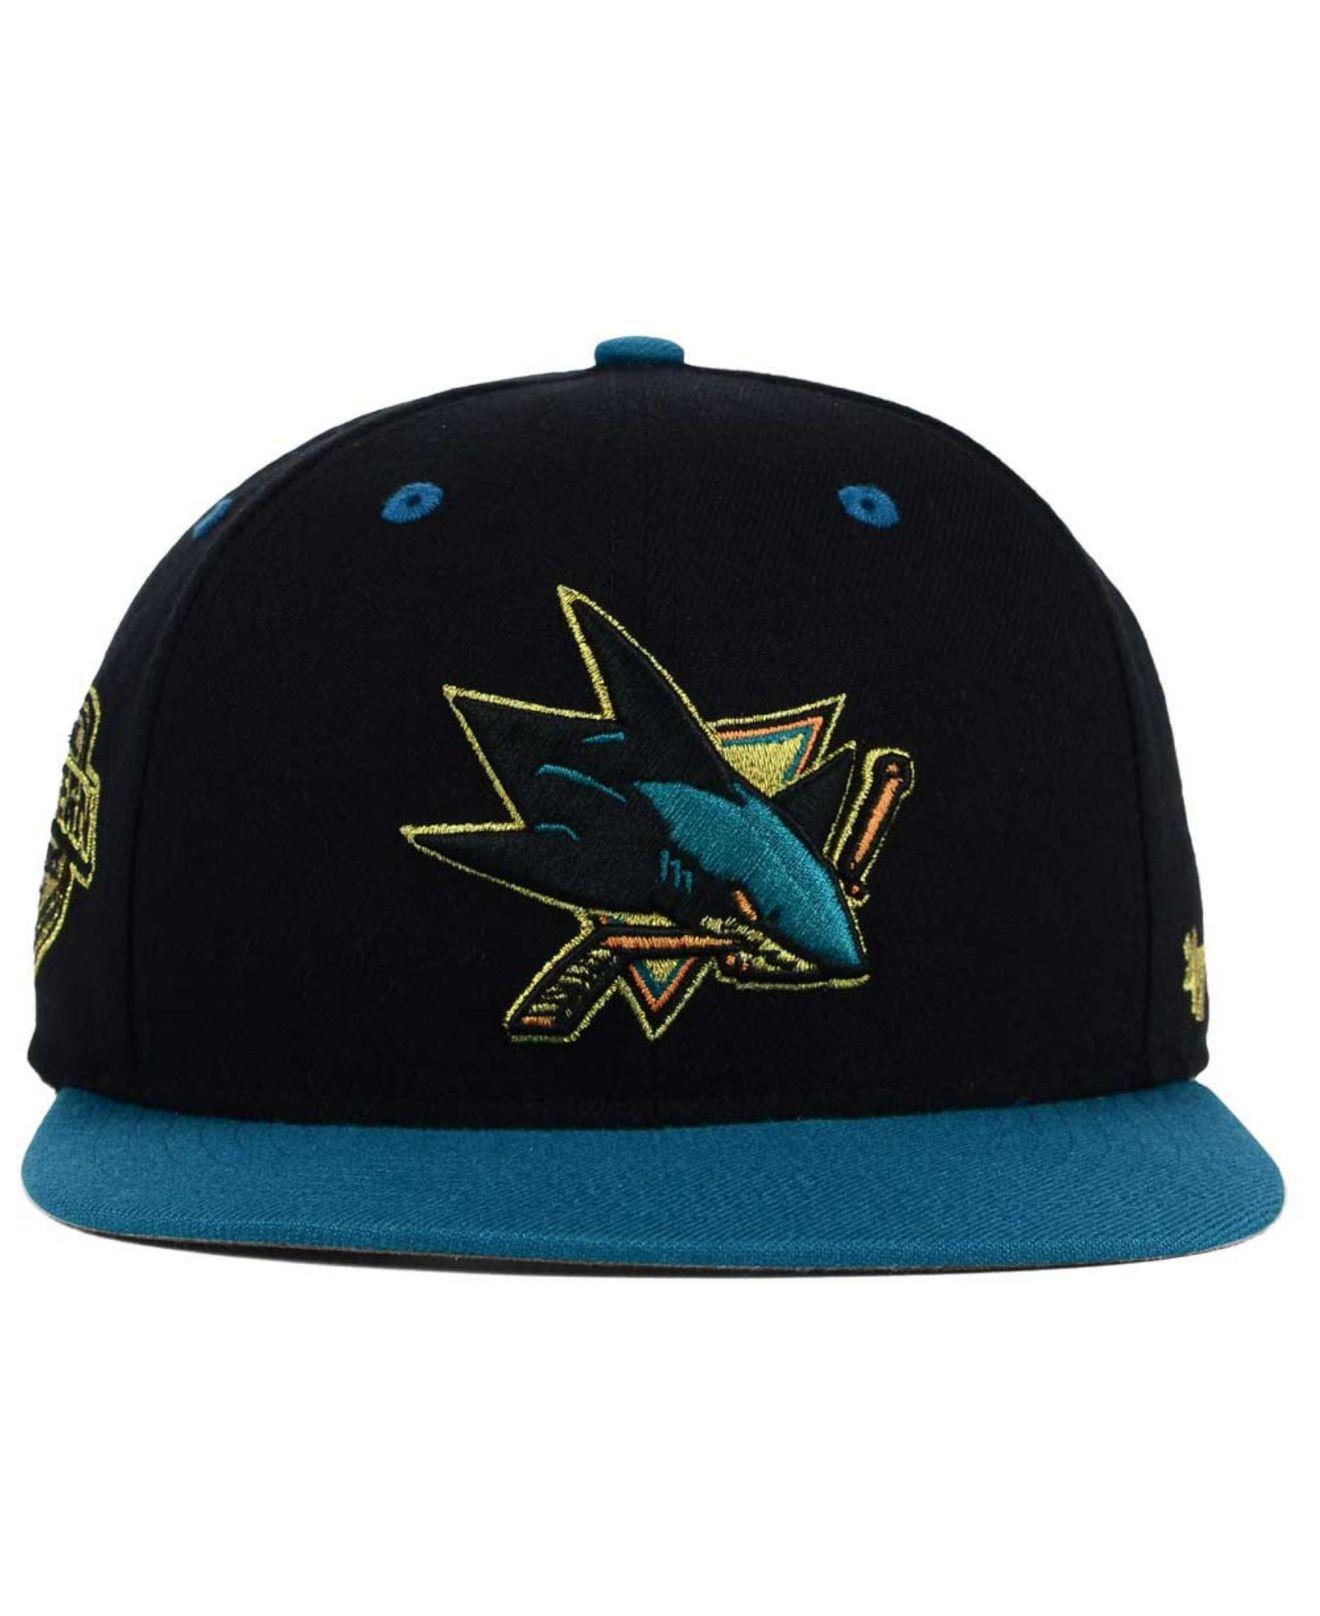 on sale 70330 b60a8 ... order lyst 47 brand san jose sharks gold rush snapback cap in black for  men 8e874